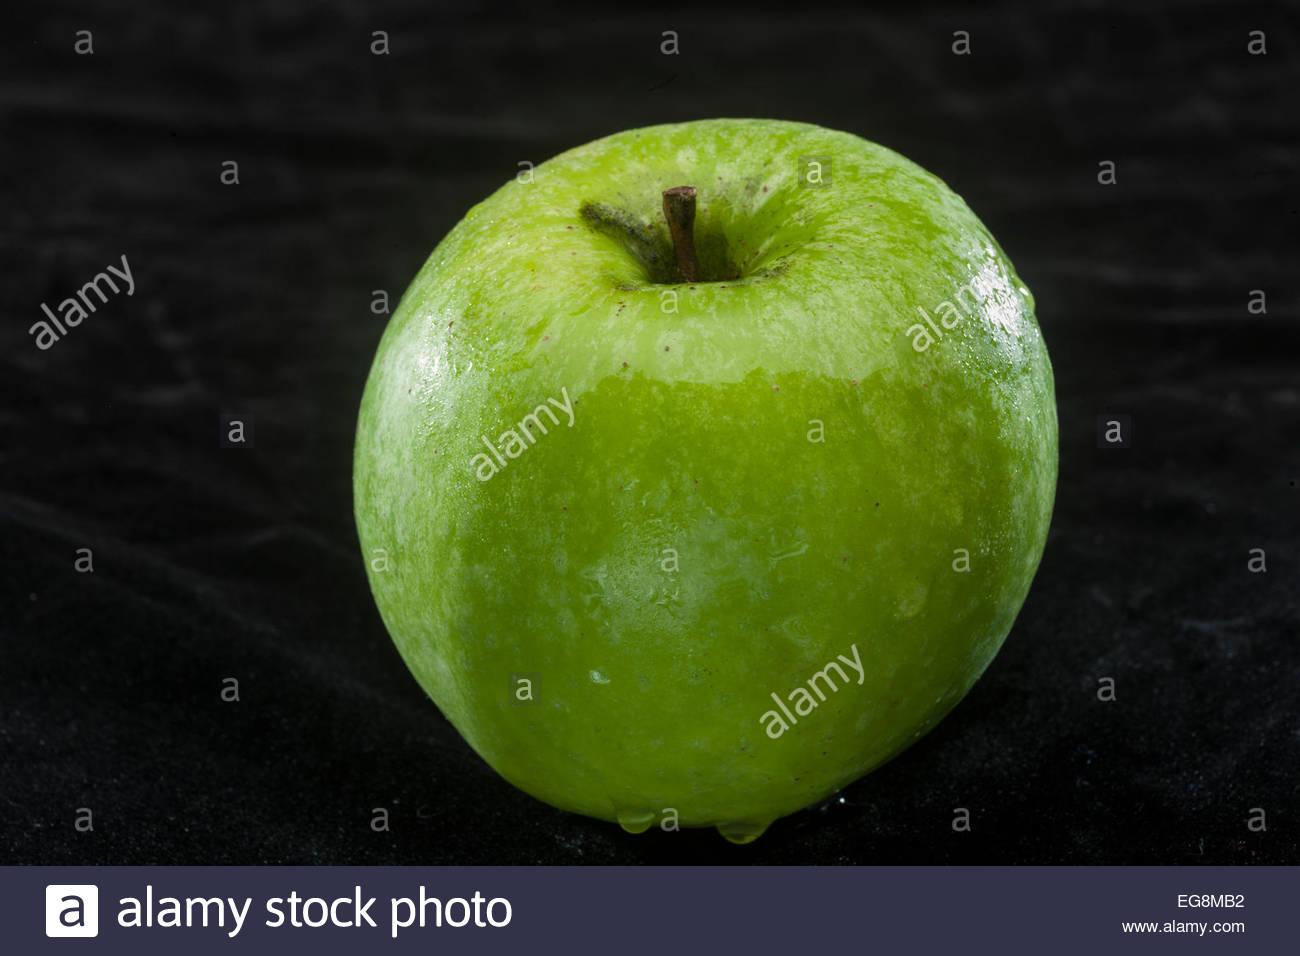 green apple on black background - Stock Image